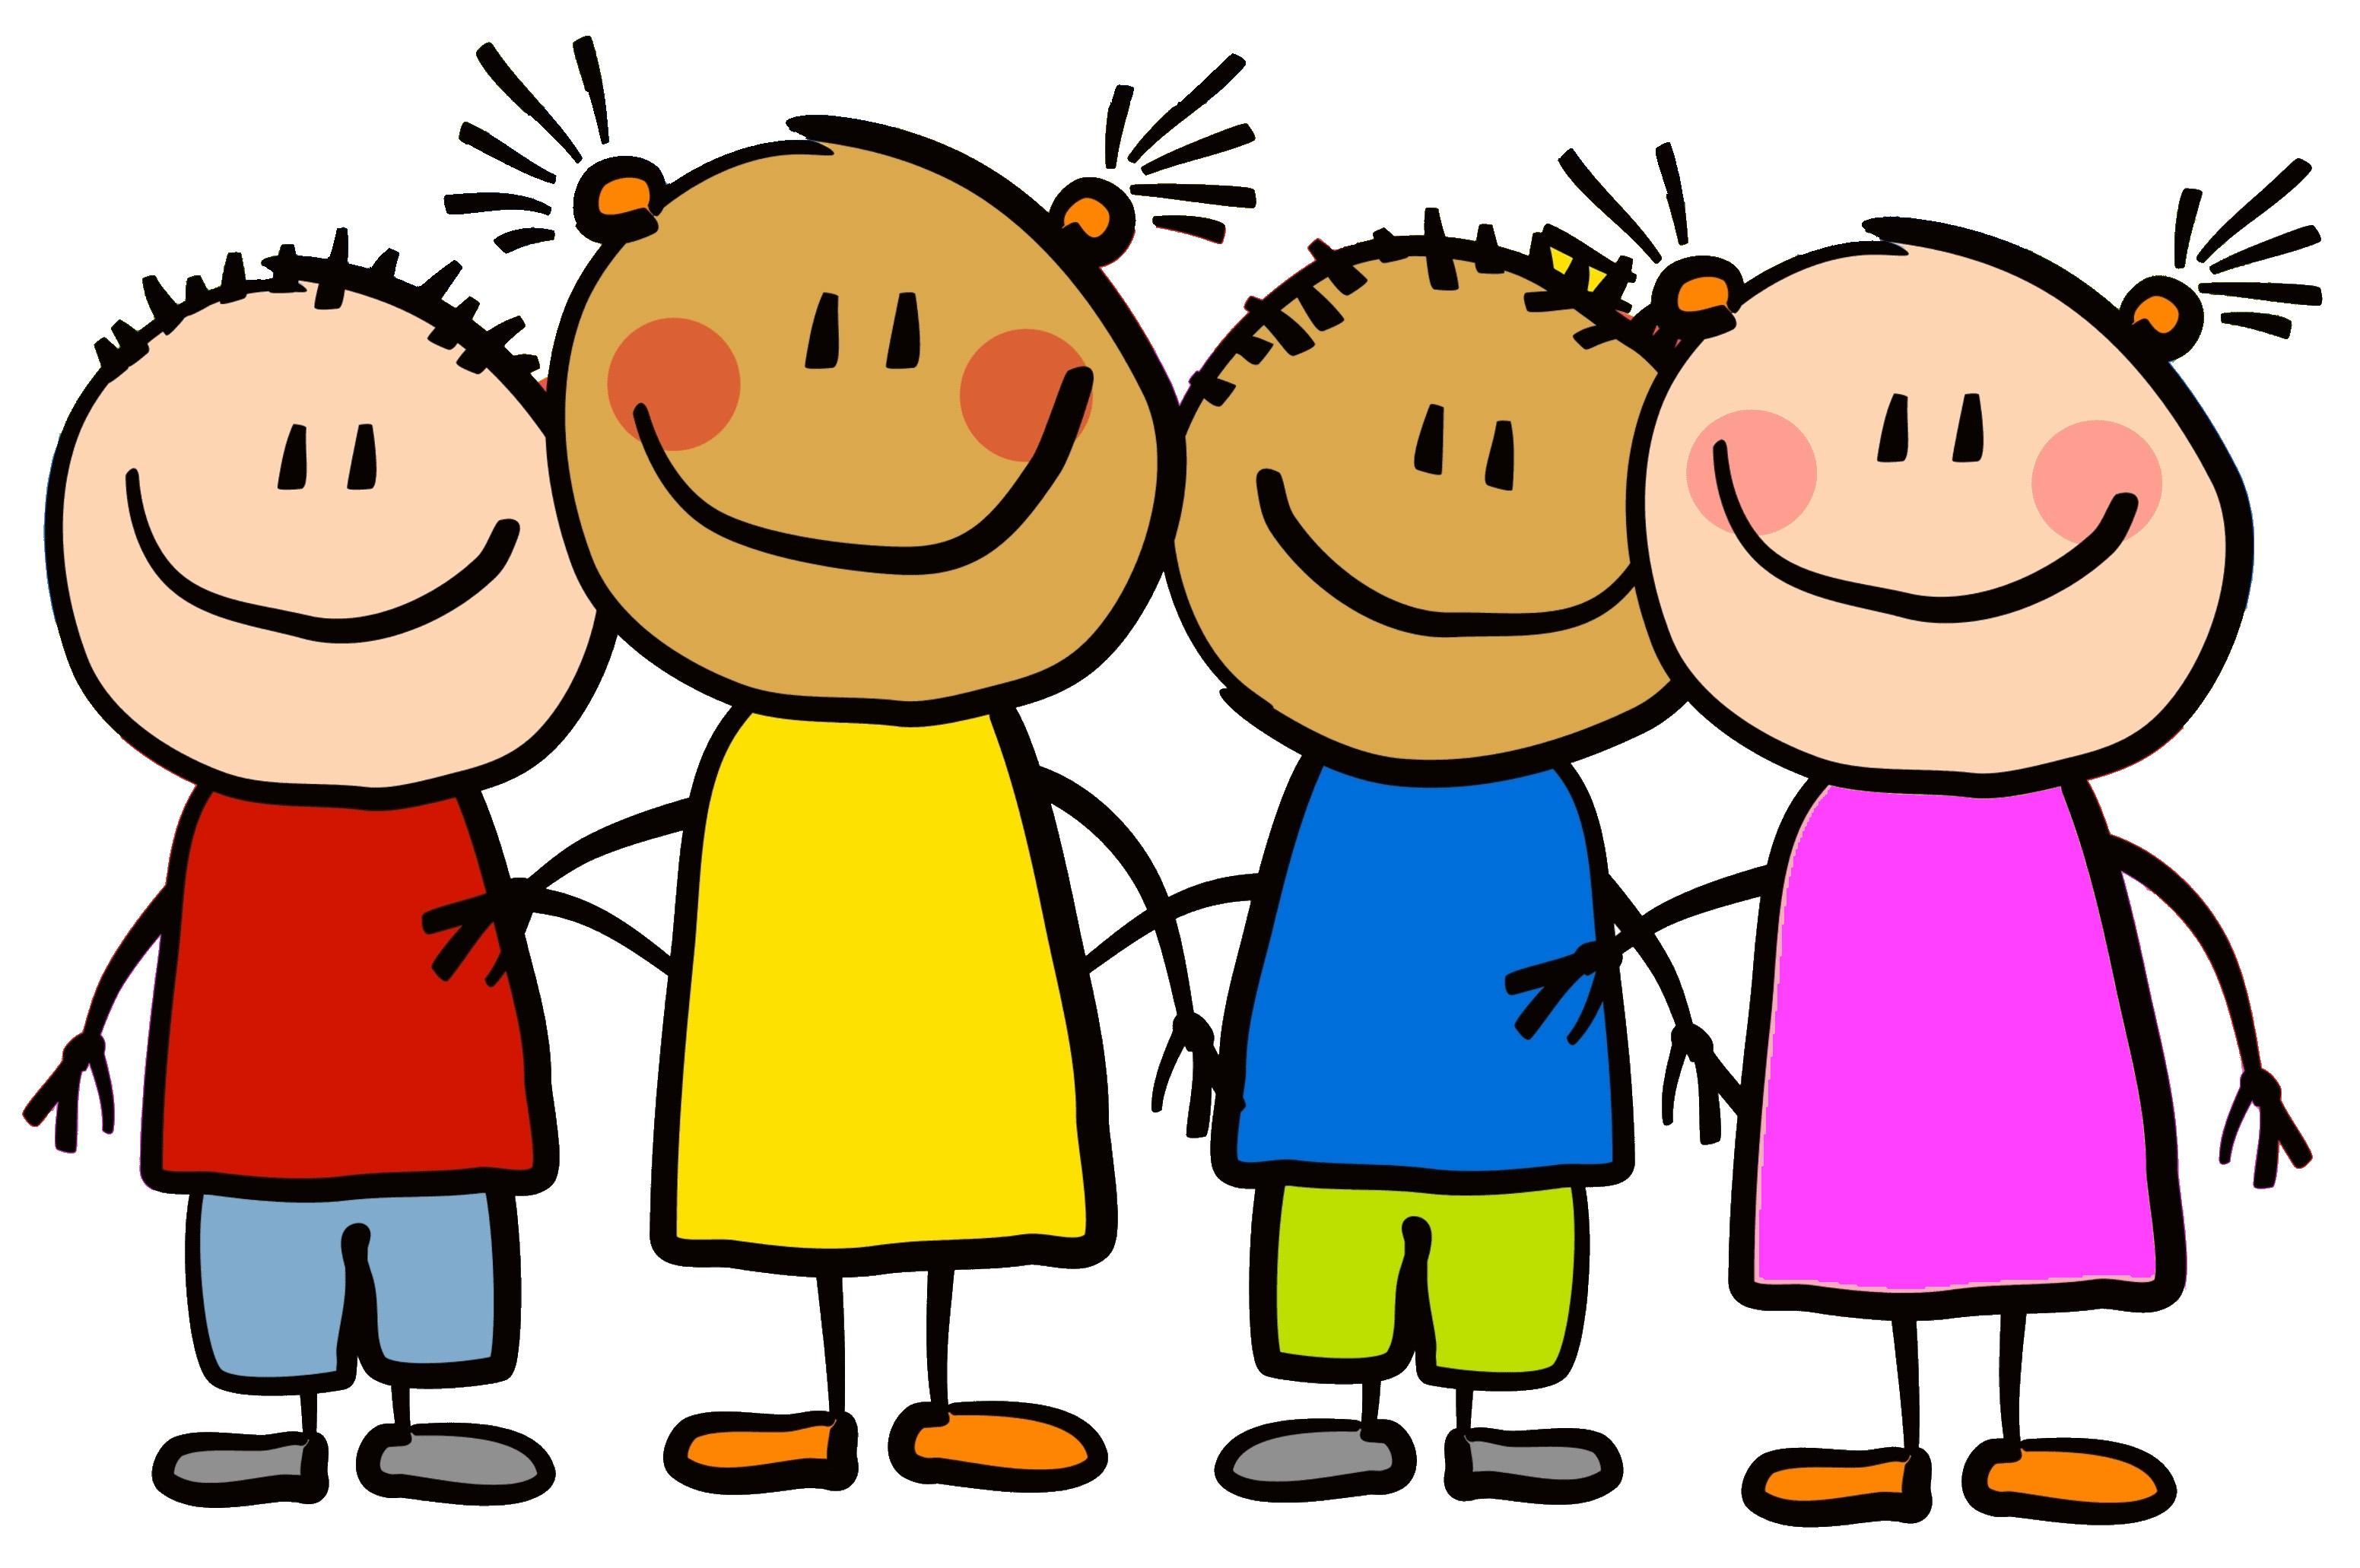 Children-clip-art-school-children-clip-art-school-1